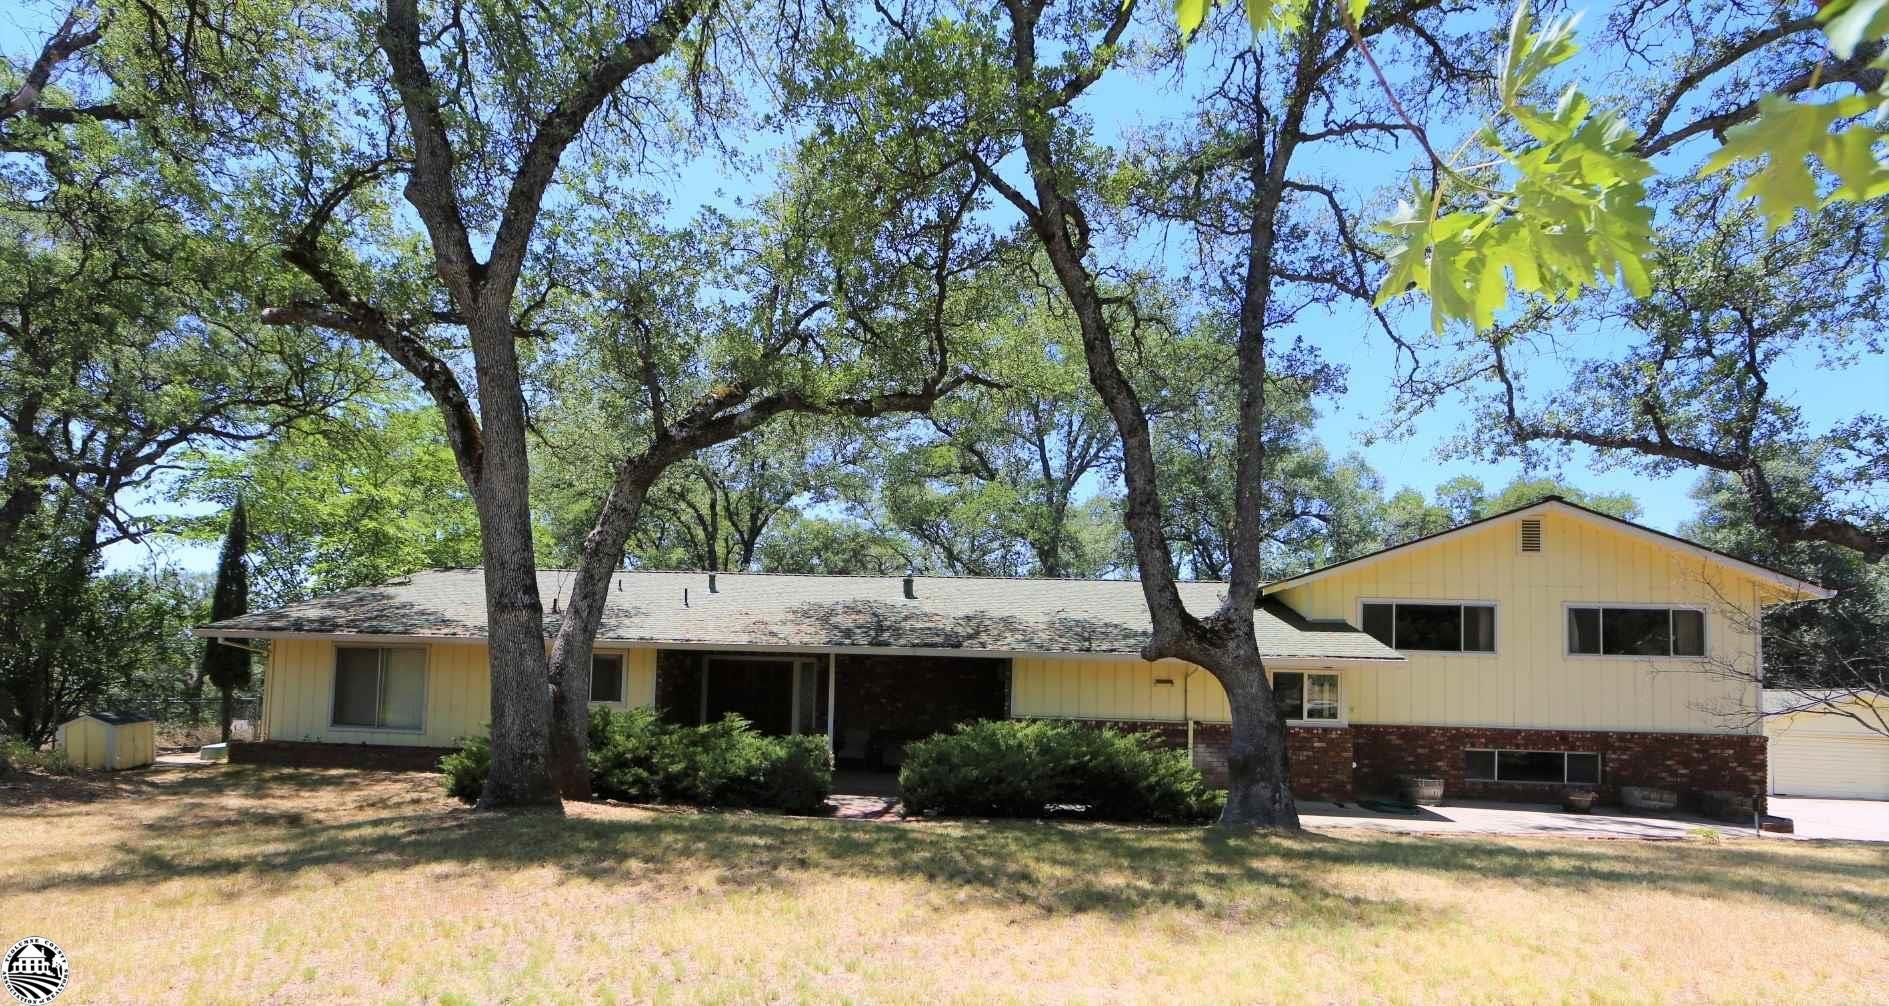 20444 Phoenix Lake Rd., Sonora, CA 95370 - MLS#: 20200912